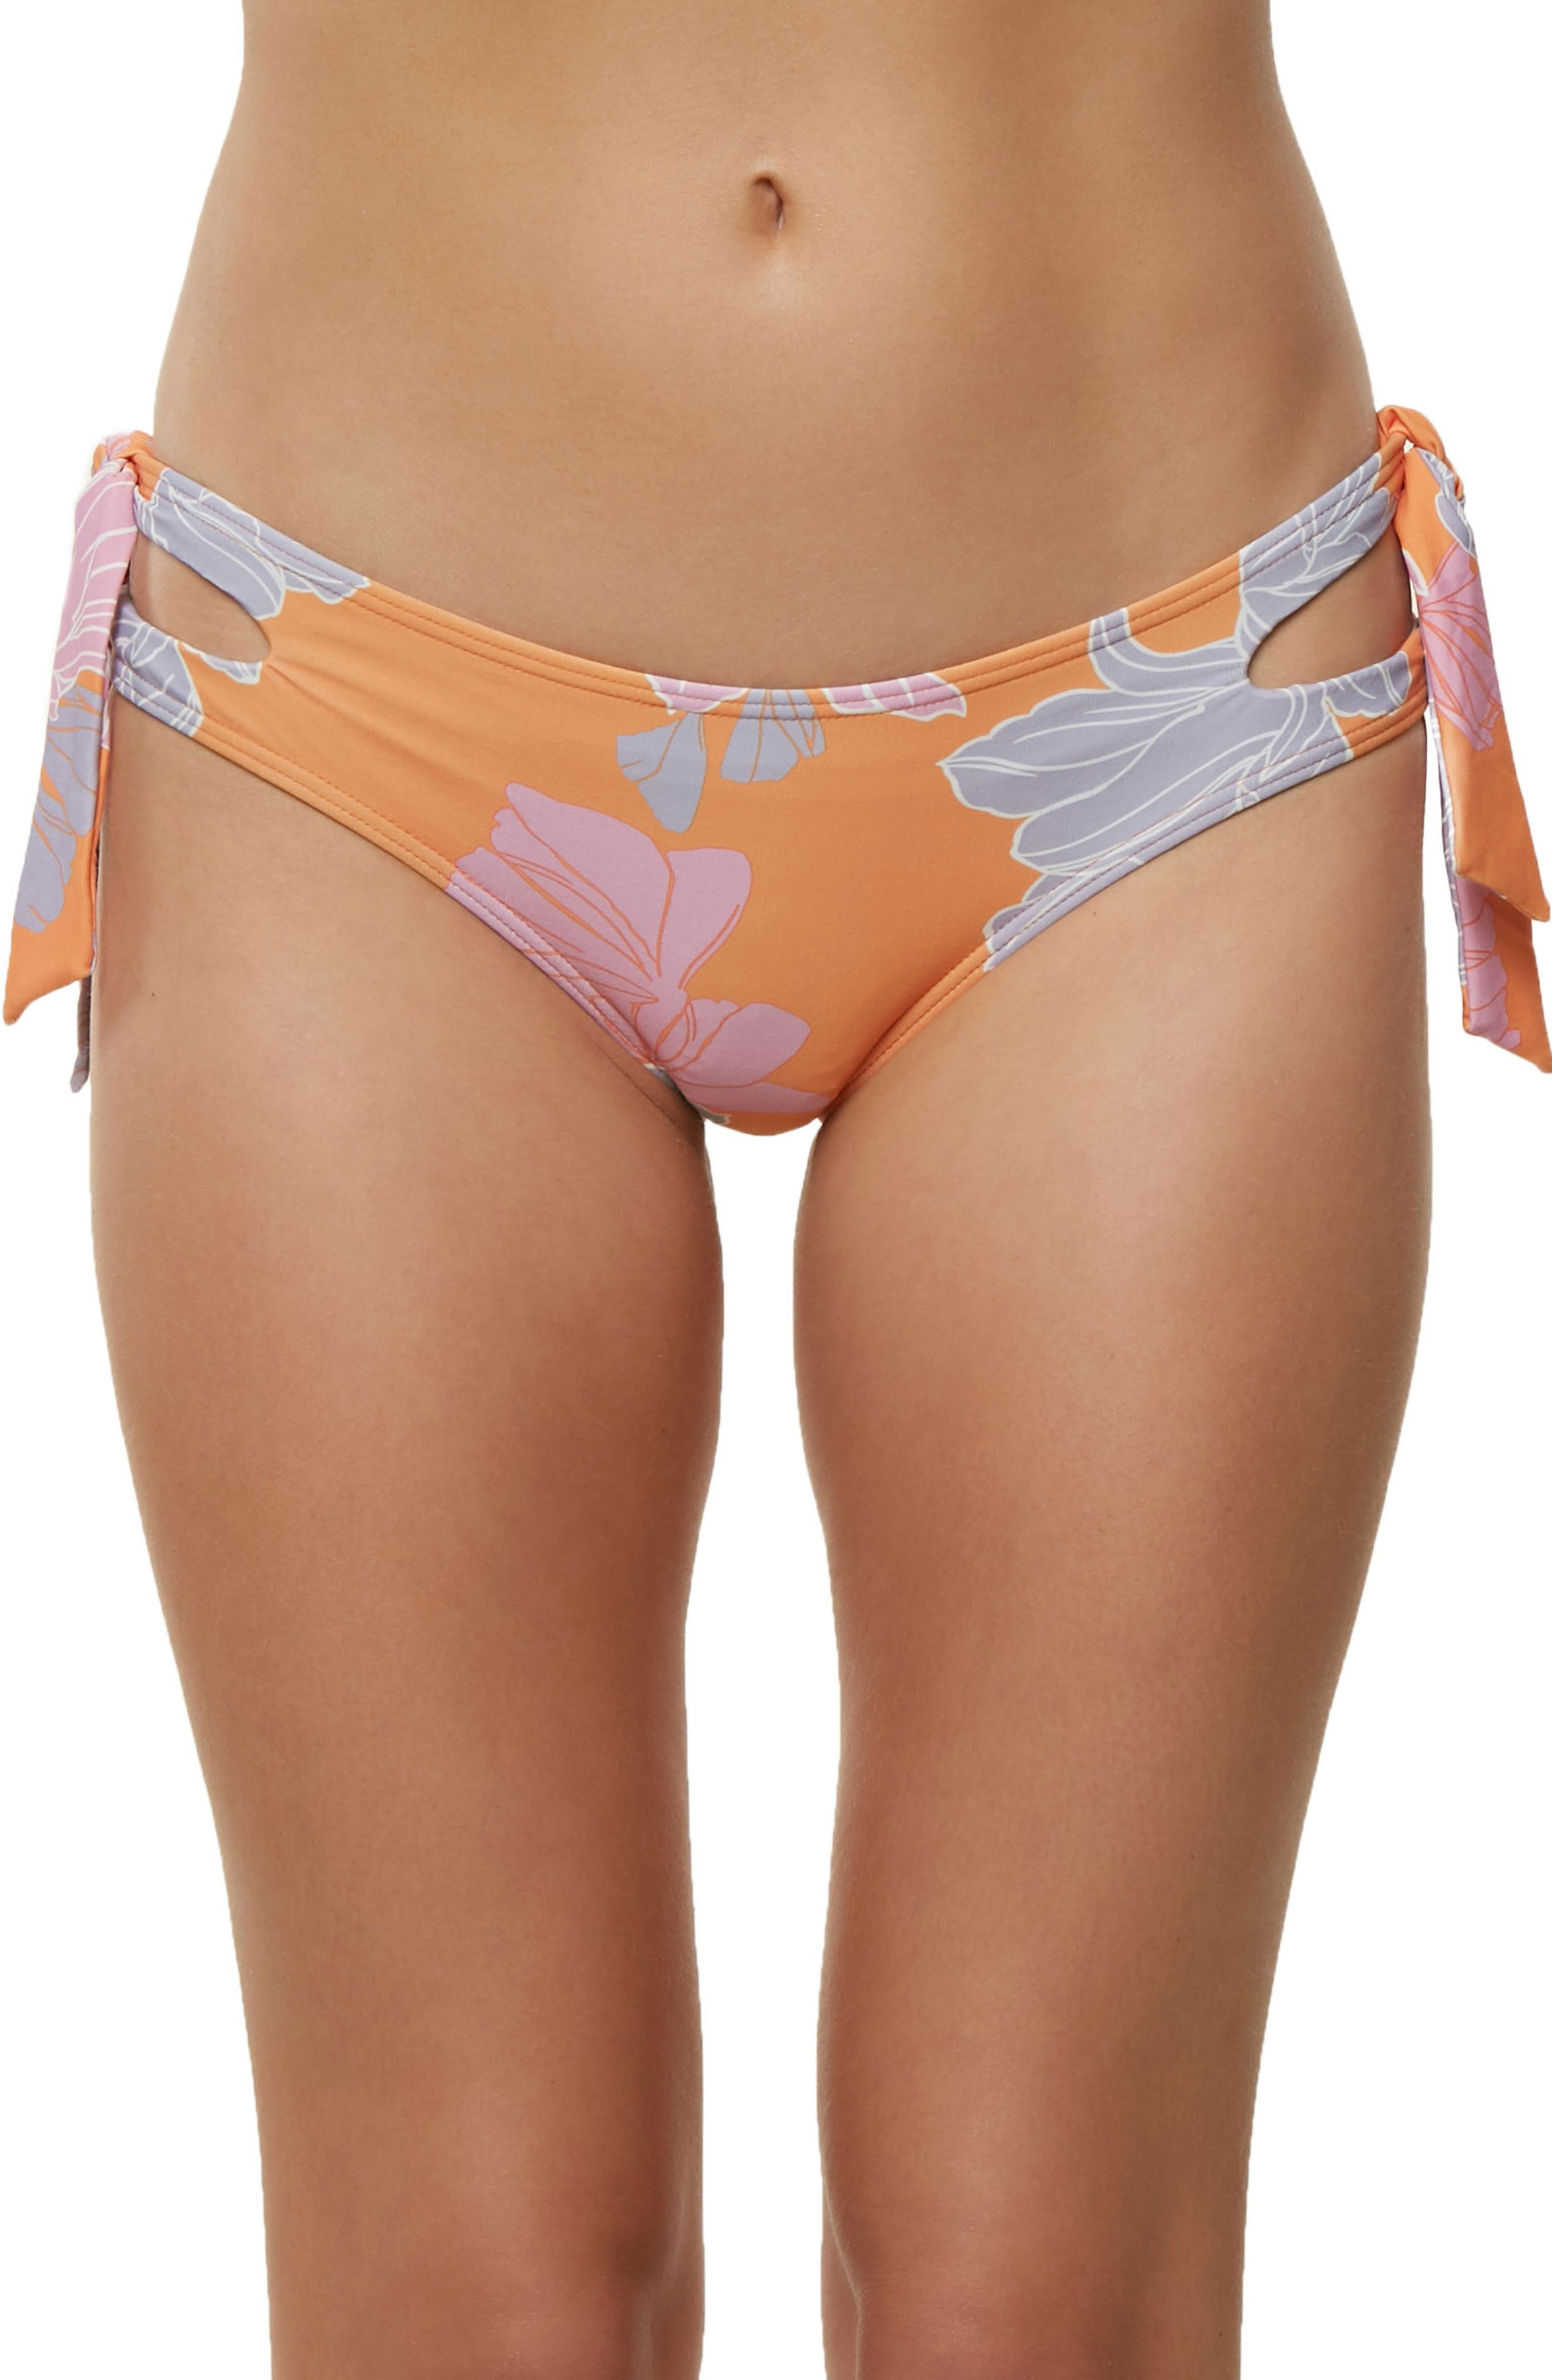 Zilla Side Tie Bikini Bottoms,                             Main thumbnail 1, color,                             Orange Multi